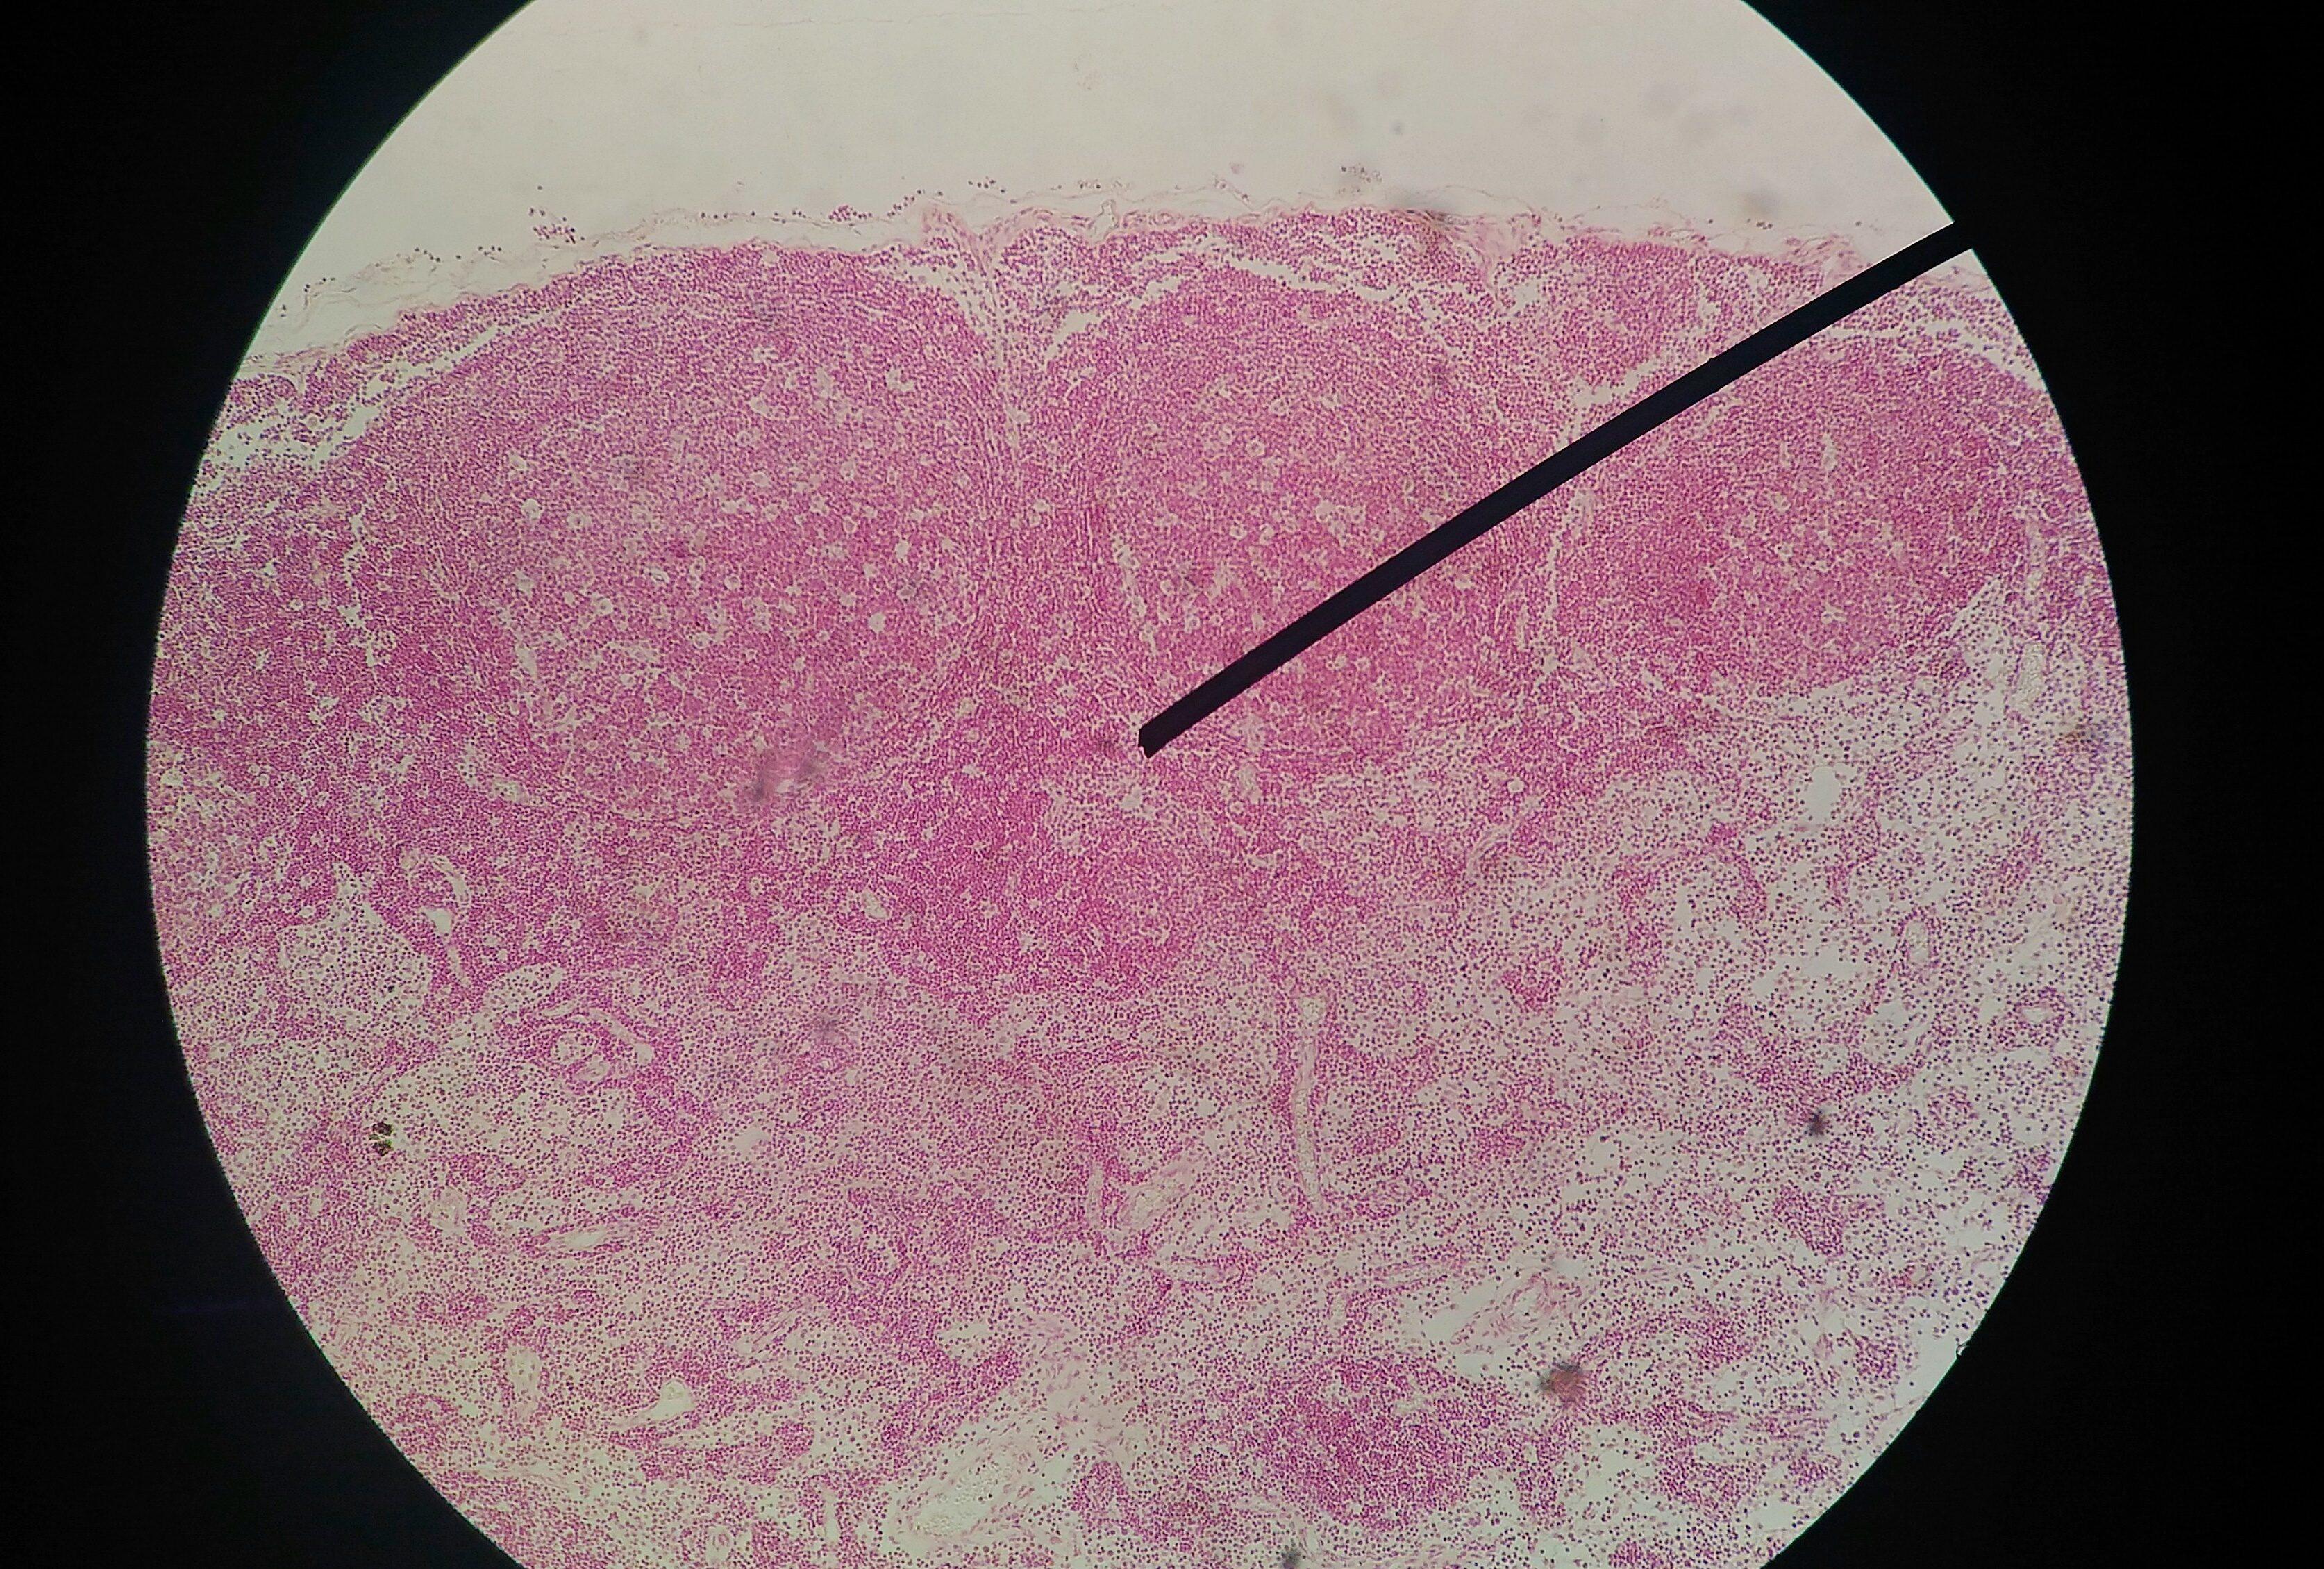 papilloma virus quali sono i sintomi